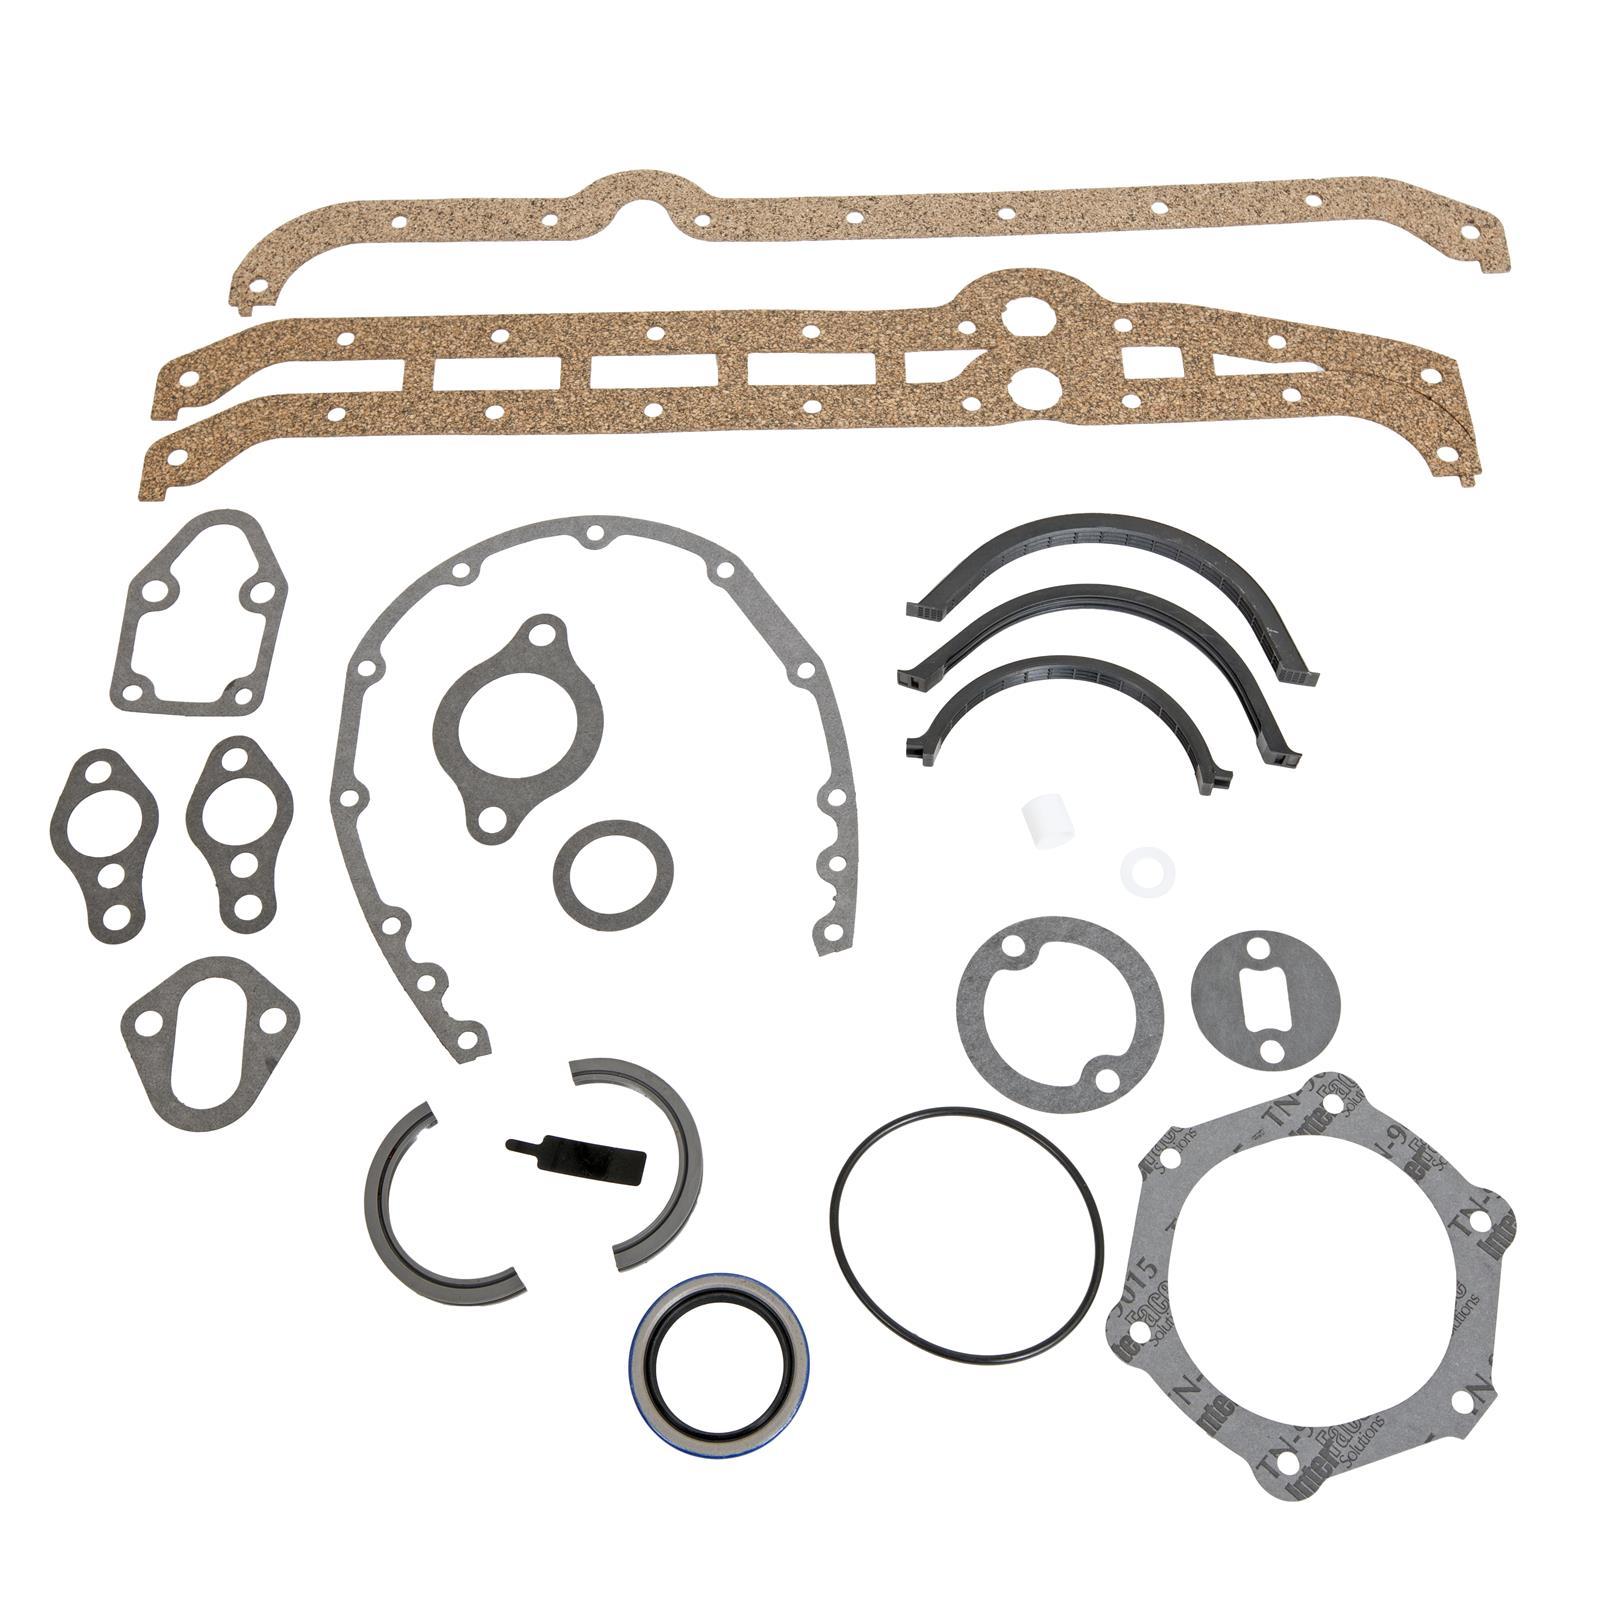 Small block Chevrolet lower engine gasket set Fel Pro CS7733-2